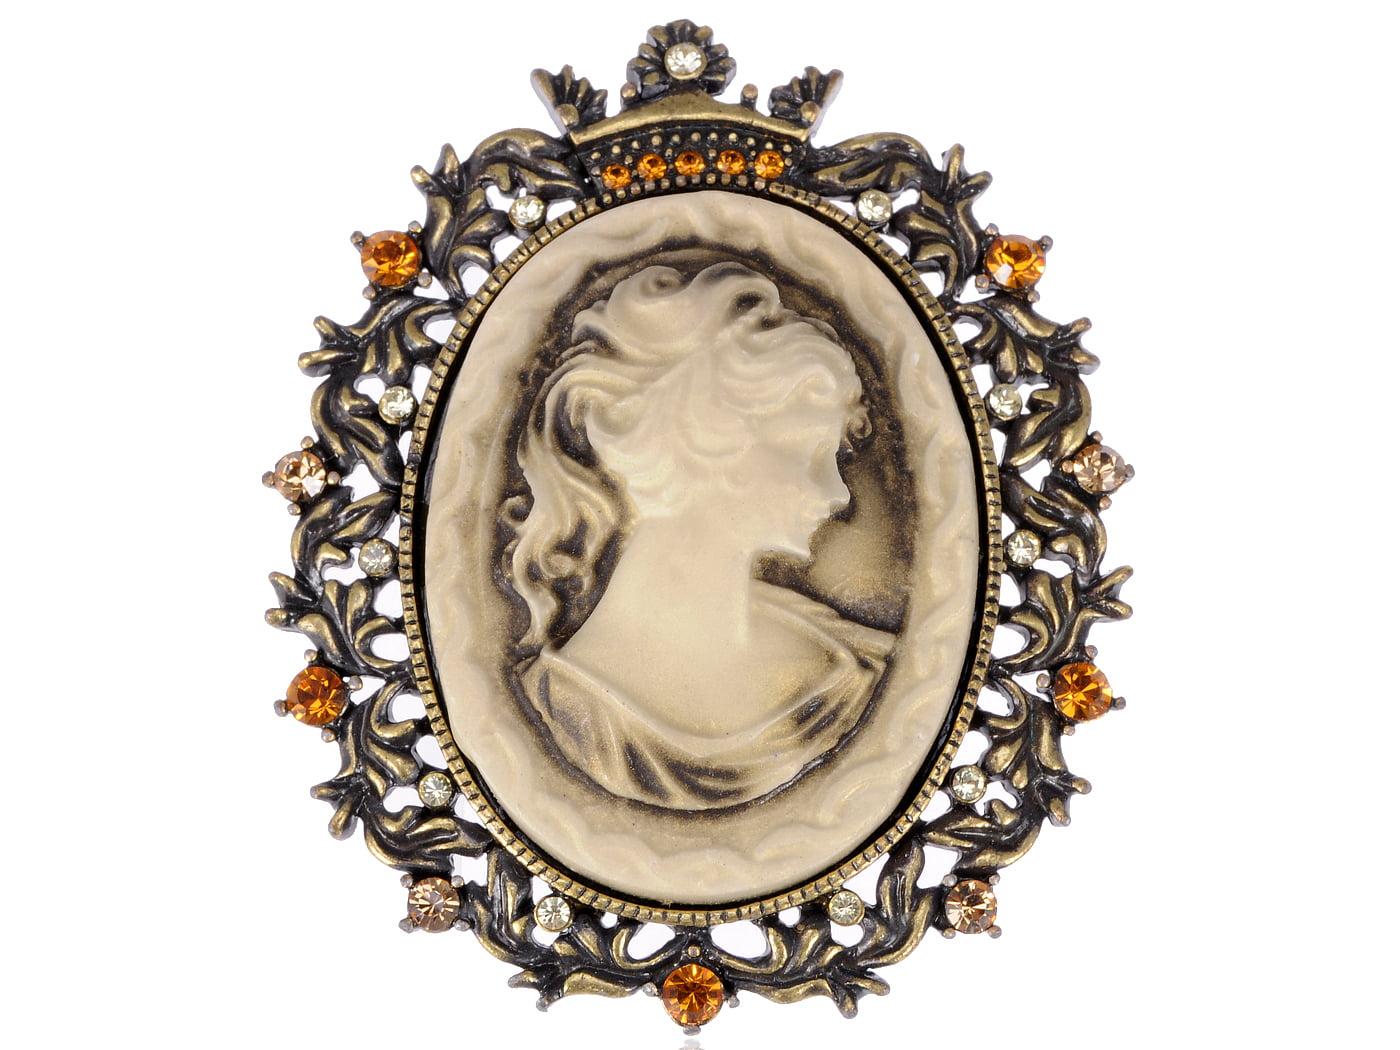 Princess Portrait Cameo Maid Vintage Gift Topaz Crystal Rhinestone Pin Brooch by